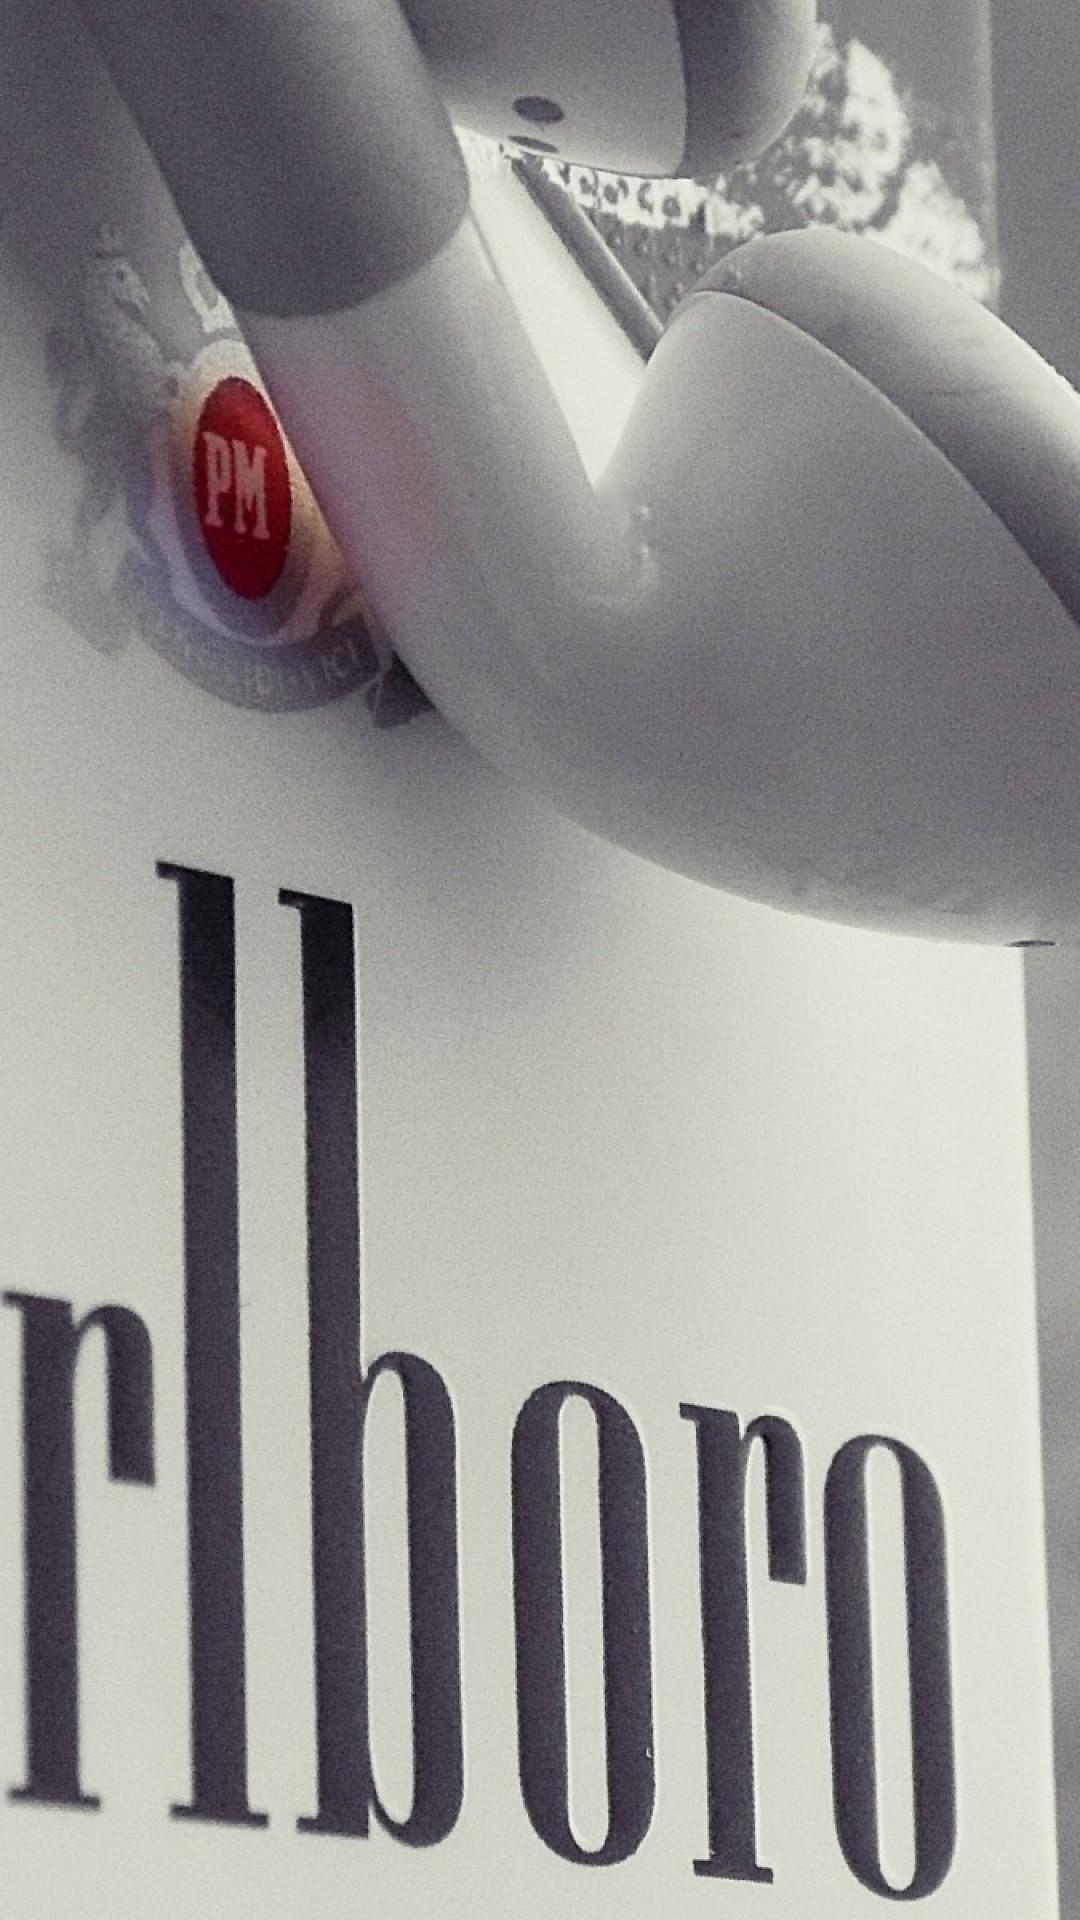 1080x1920 Wallpaper Marlboro Cigarettes Apple Headphones Brand